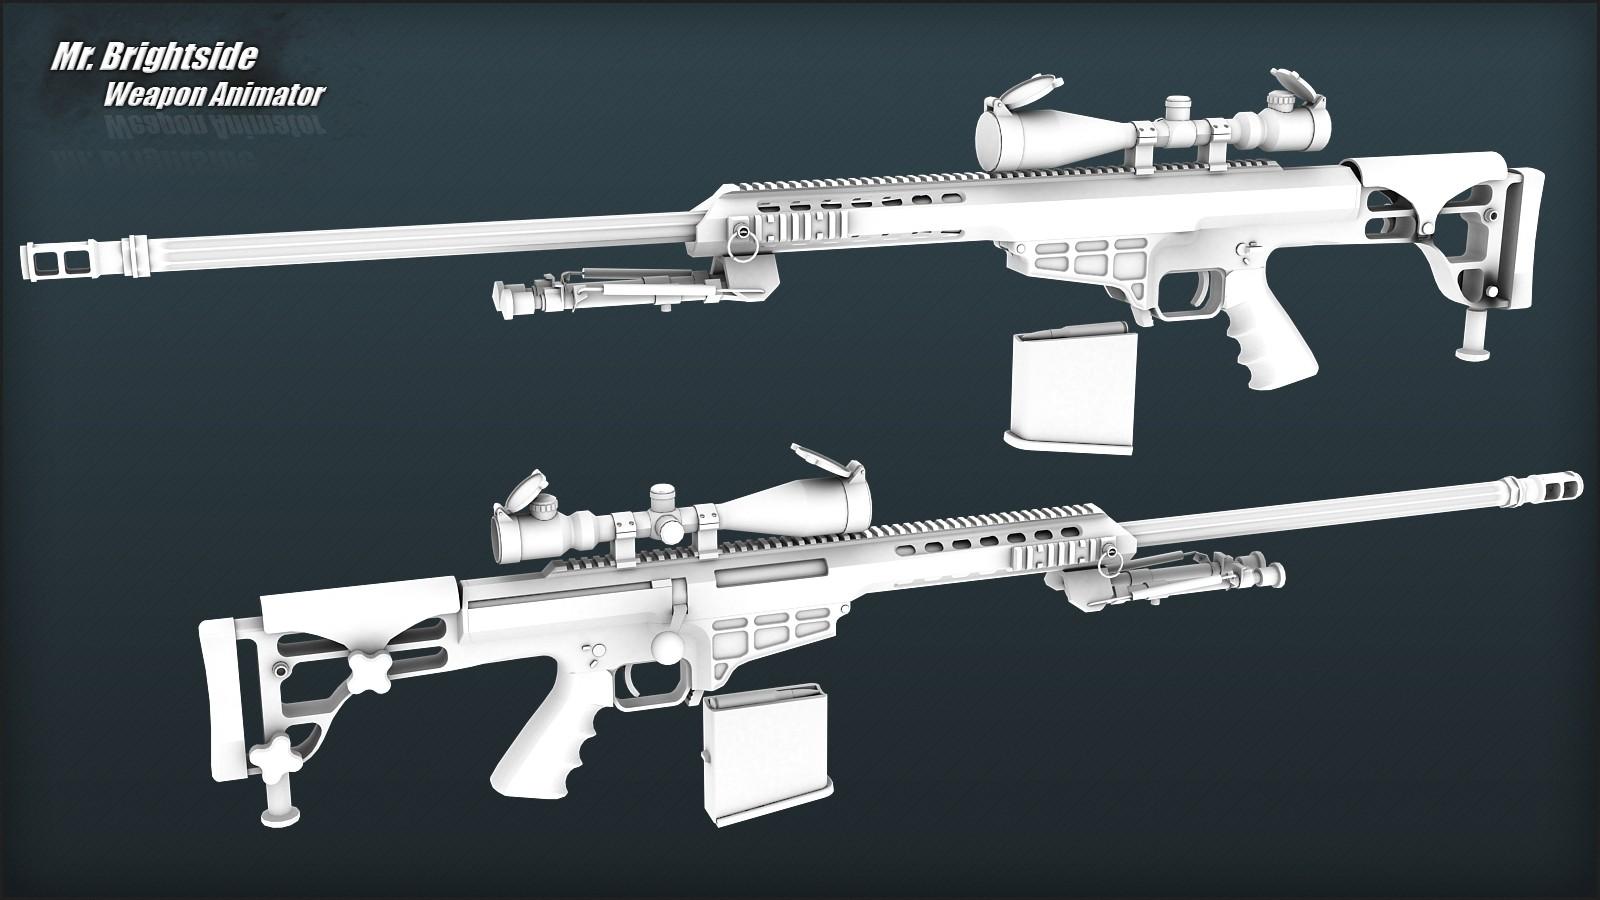 m98b sniper rifle - photo #35